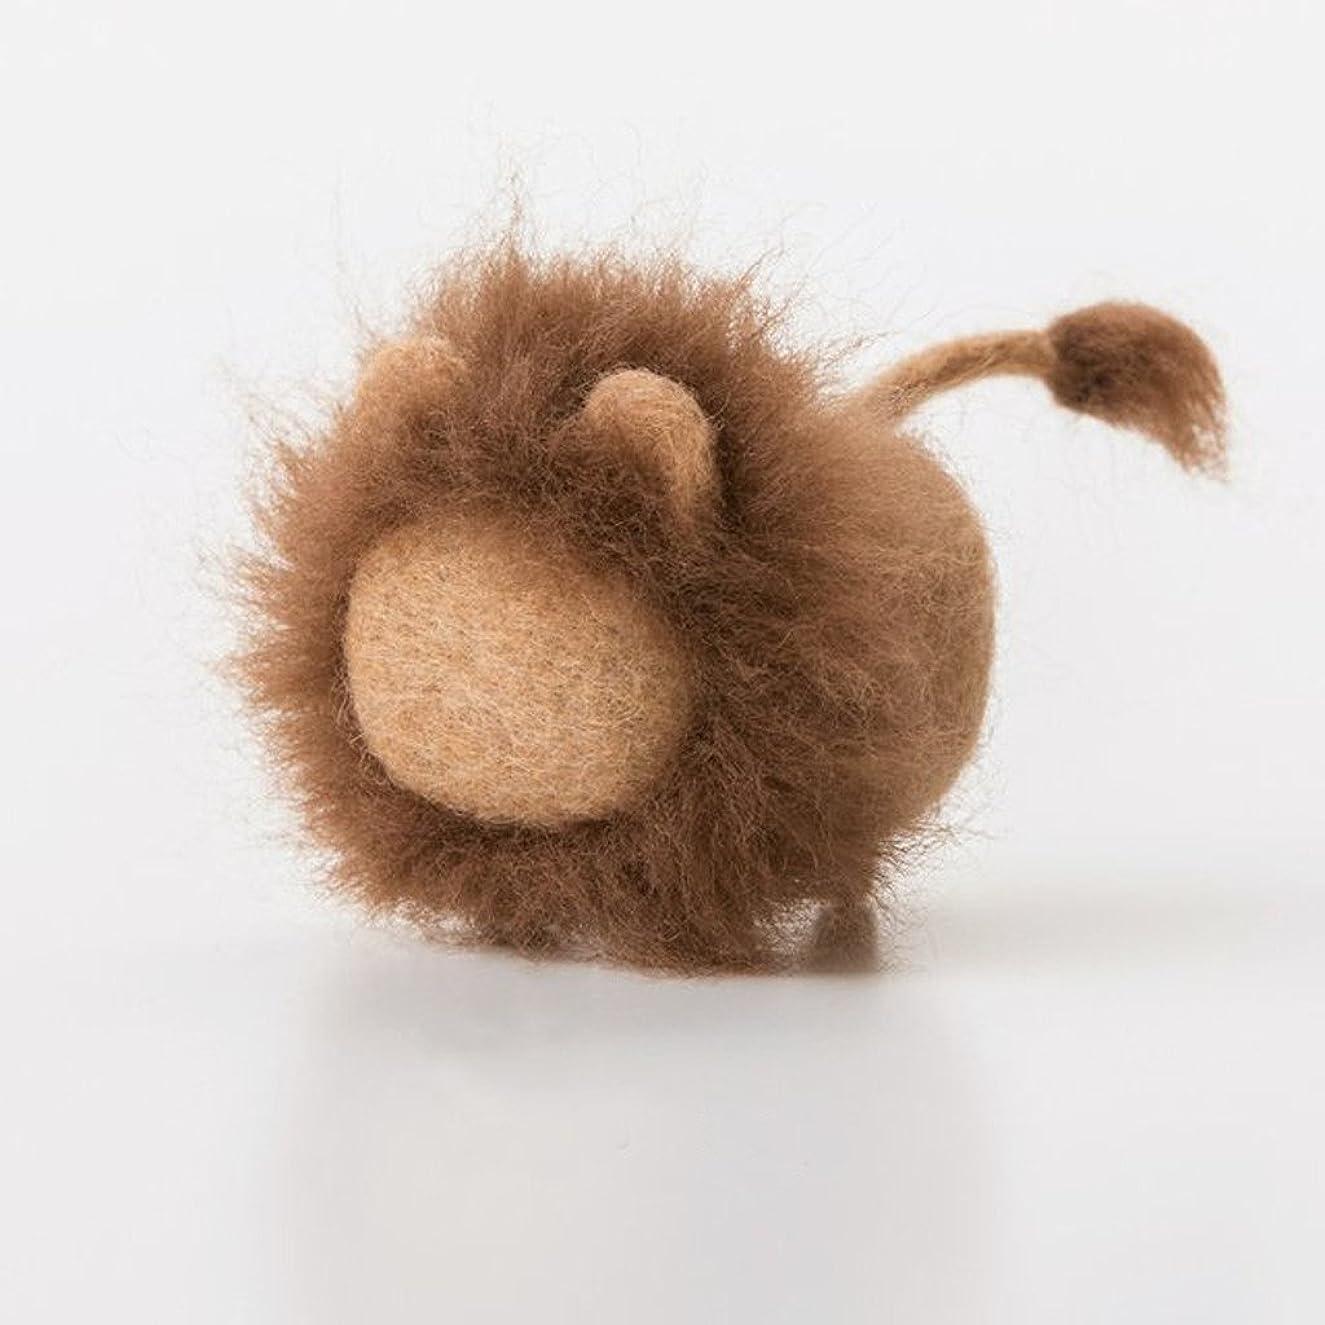 Truslin - DIY Needle Felting Kit with Gift Box DIY Toys Faceless Animal - Lion